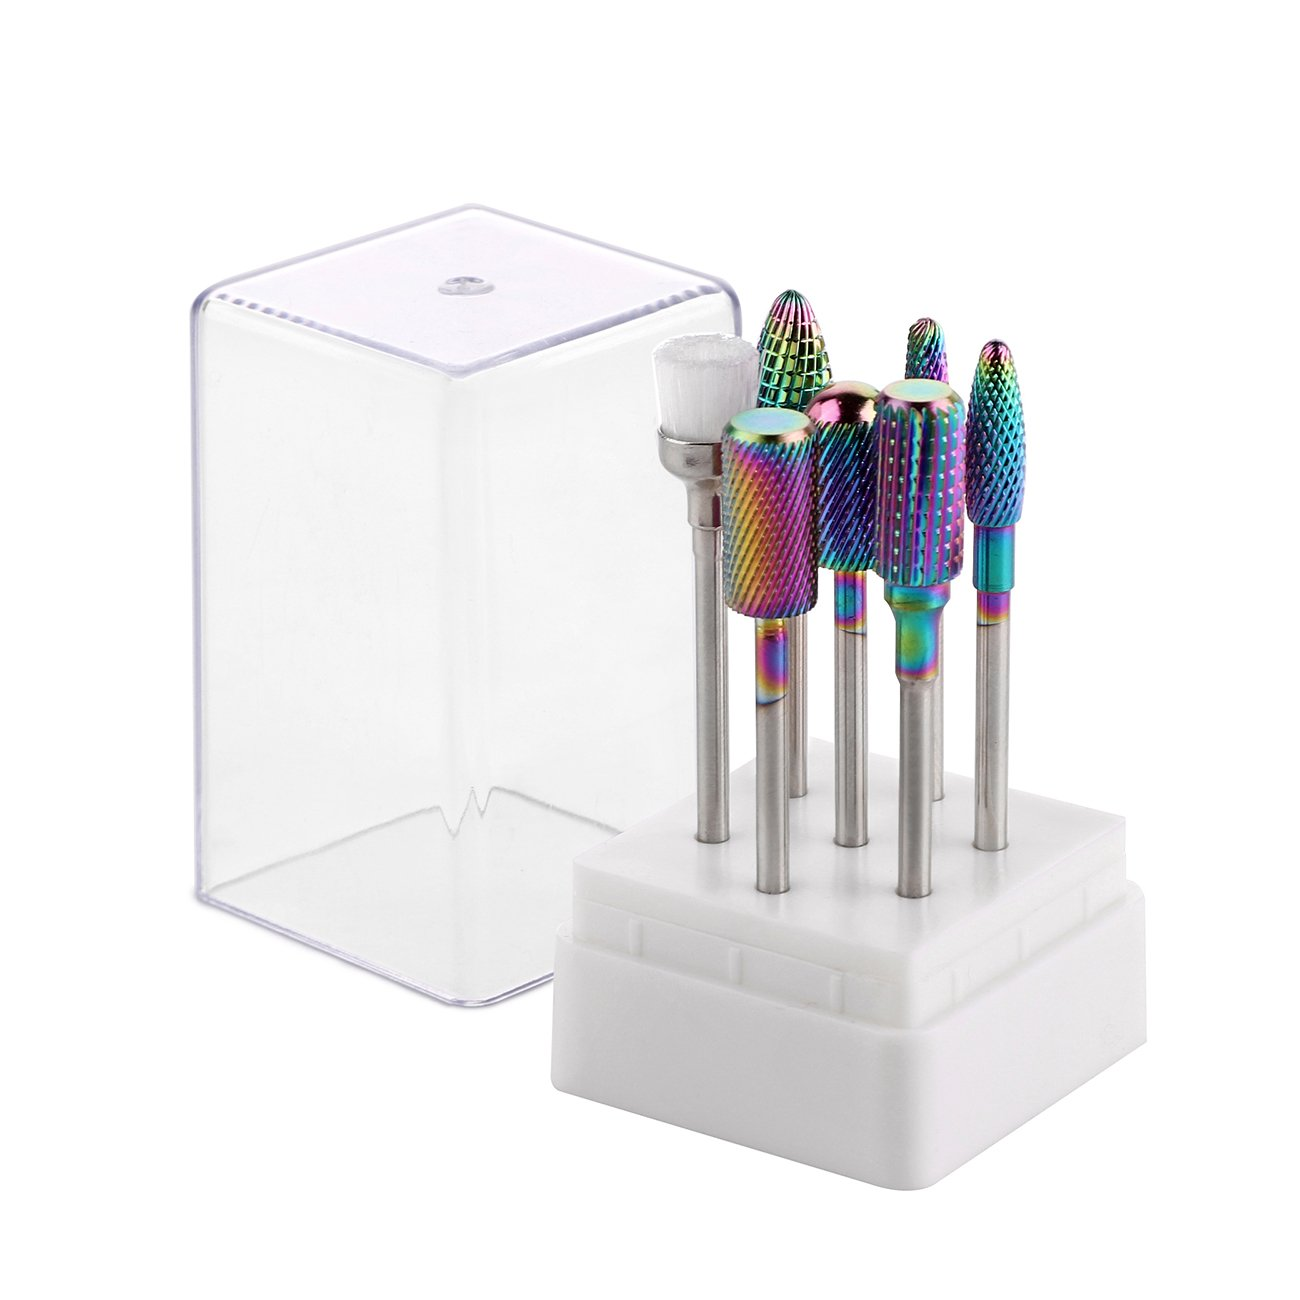 MAKARTT A-14 Tungsten Carbide Nail Drill Bits Set 7Pcs Less Dust Acrylic Nail File Drill Bit Manicure Pedicure 3/32